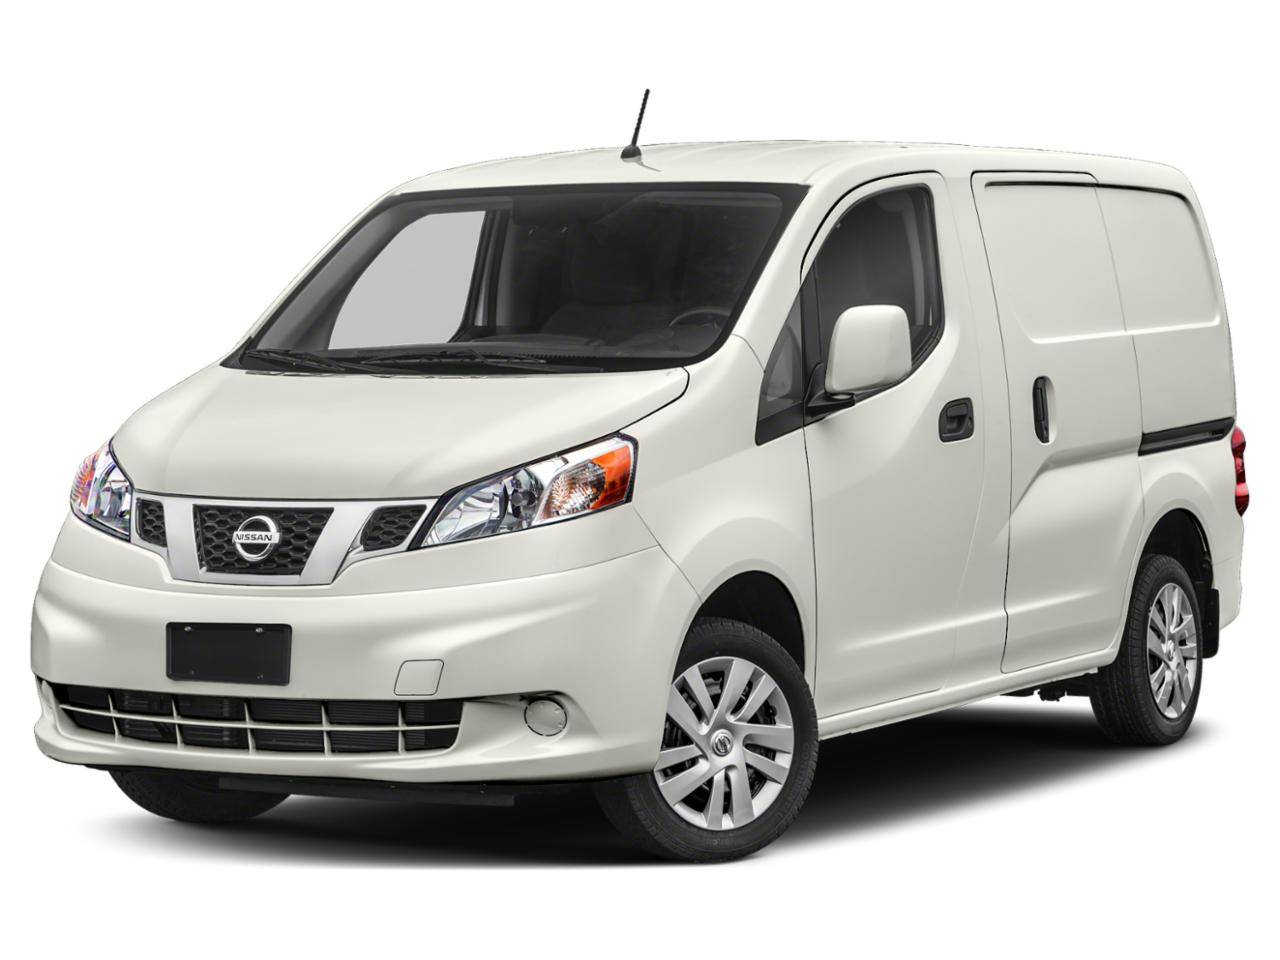 orangeburg used nissan vehicles for sale orangeburg used nissan vehicles for sale